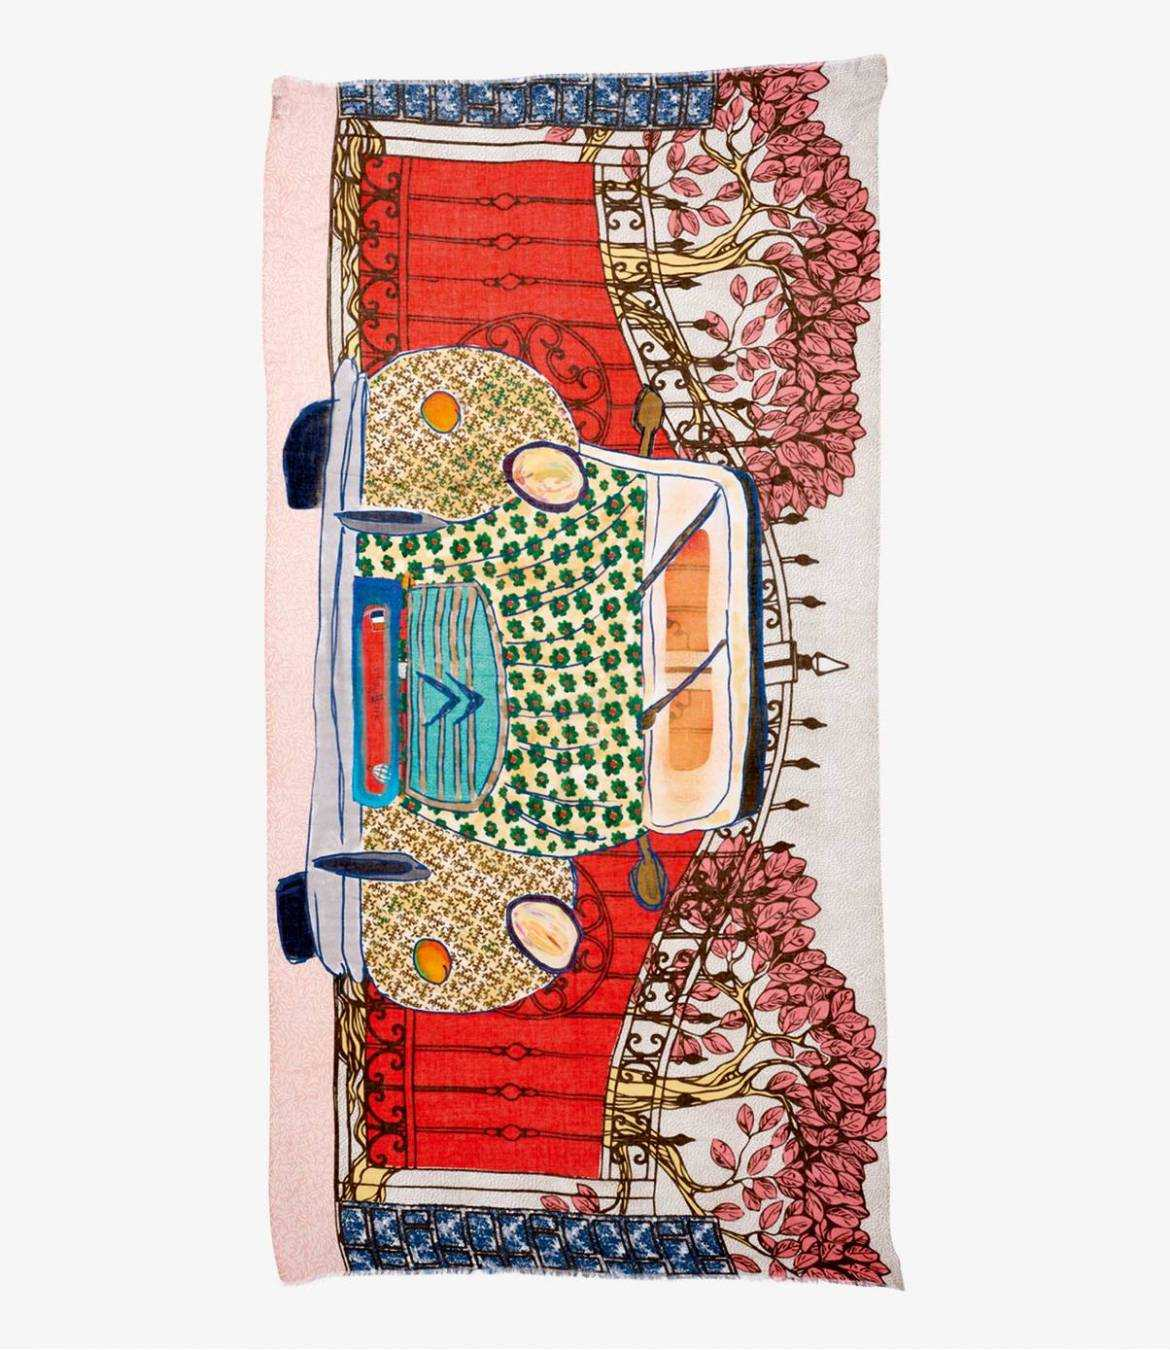 GRETA Foulard en Modal, Soie pour Femme 100x200 cm Storiatipic - 2